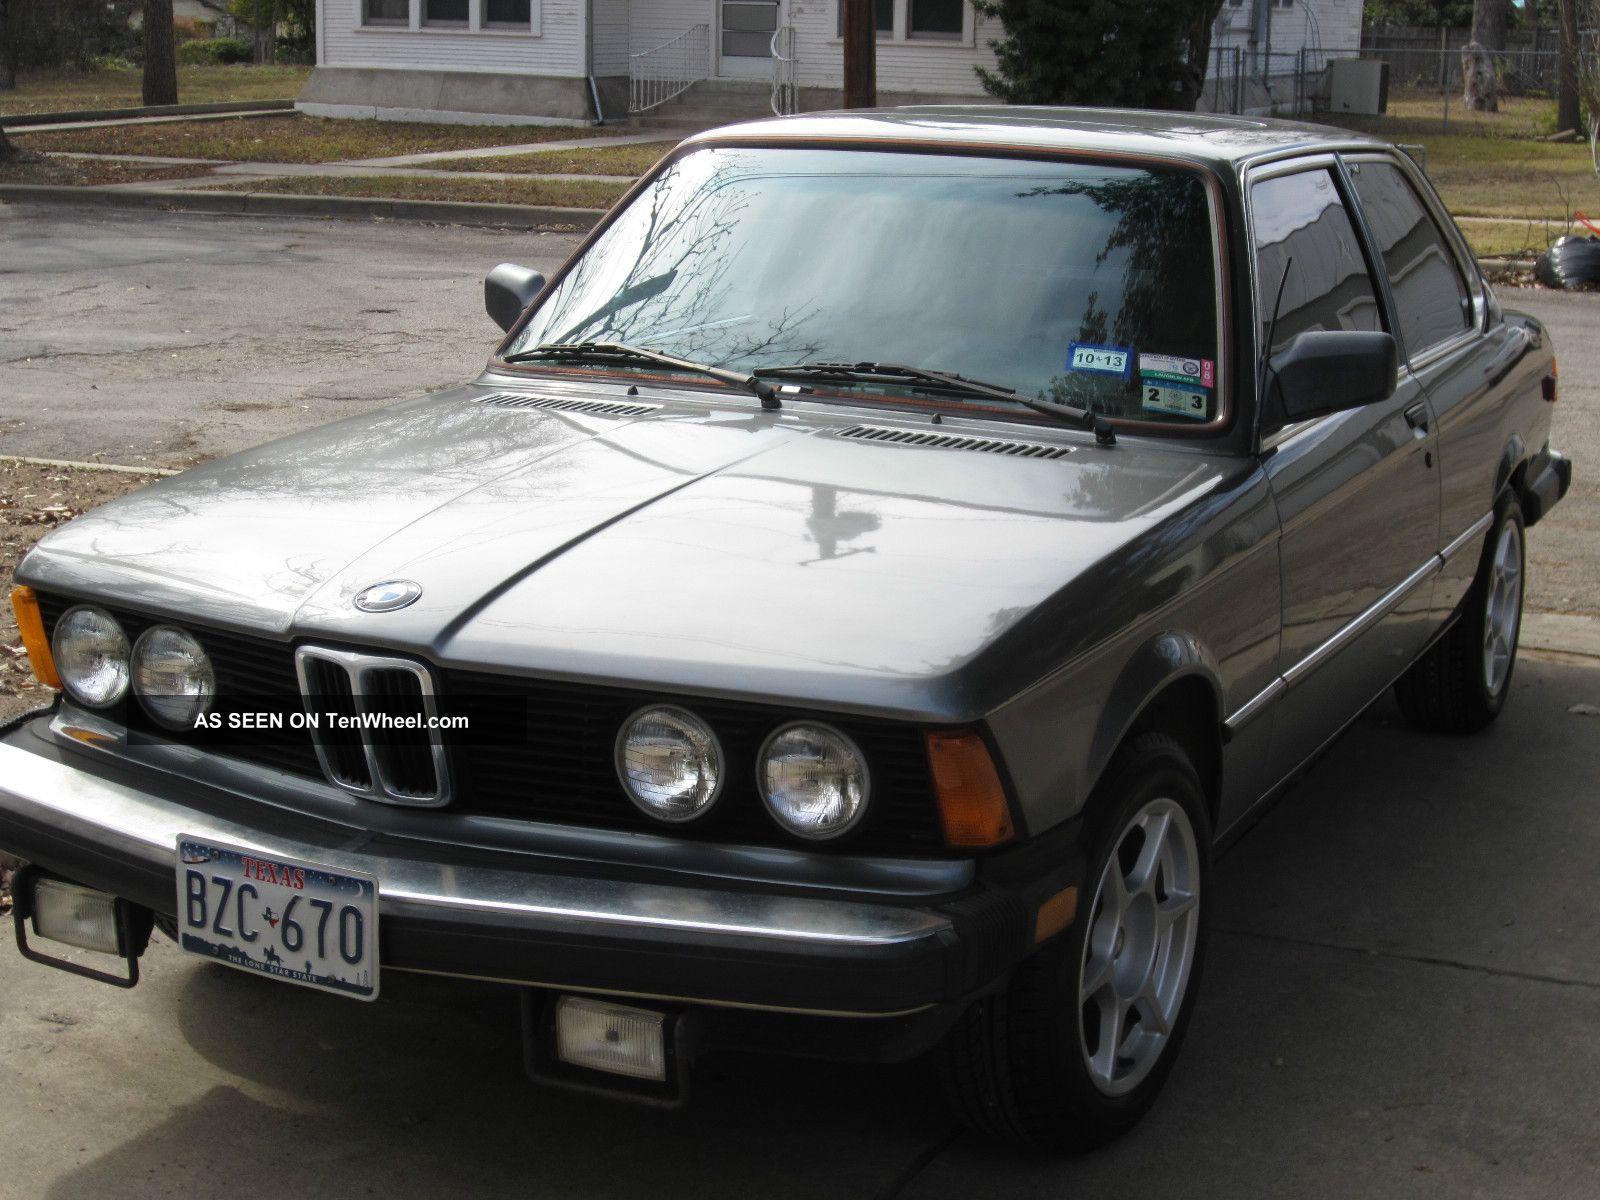 Classic 1982 Bmw 320i 3-Series photo